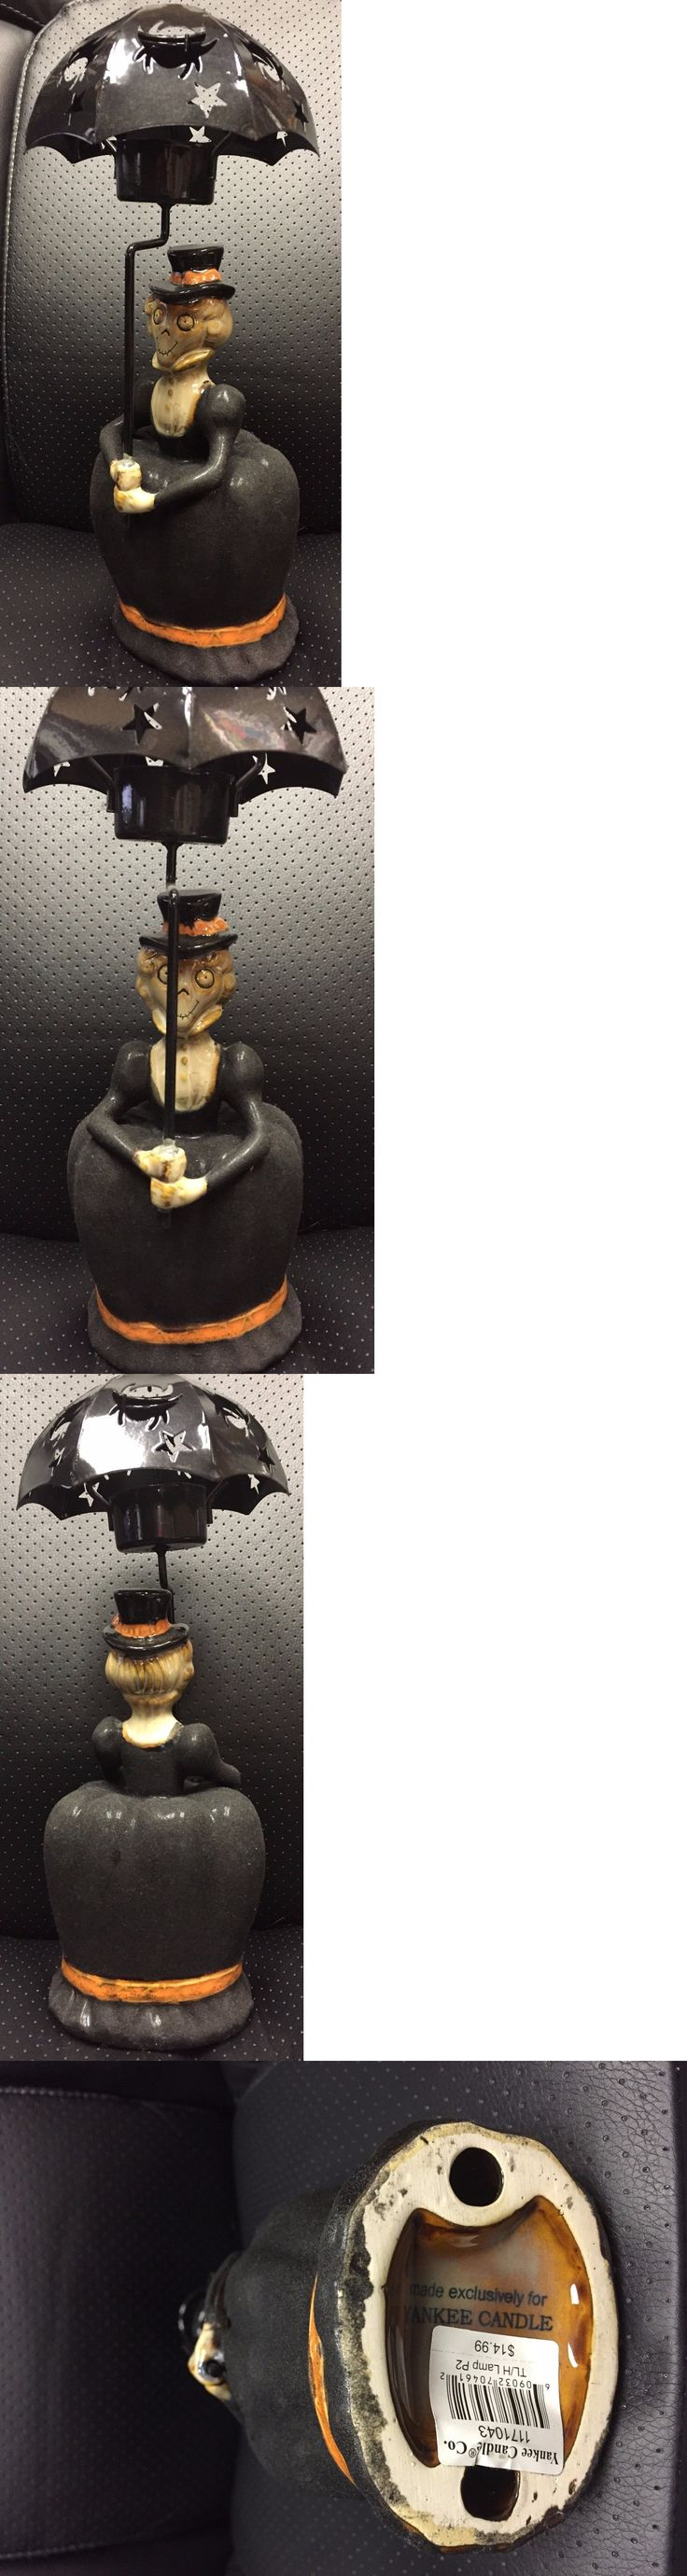 Halloween 170094: 2009 Yankee Candle Boney Bunch Aunt Hilda Umbrella Lady Tea Light Holder -> BUY IT NOW ONLY: $99.99 on eBay!